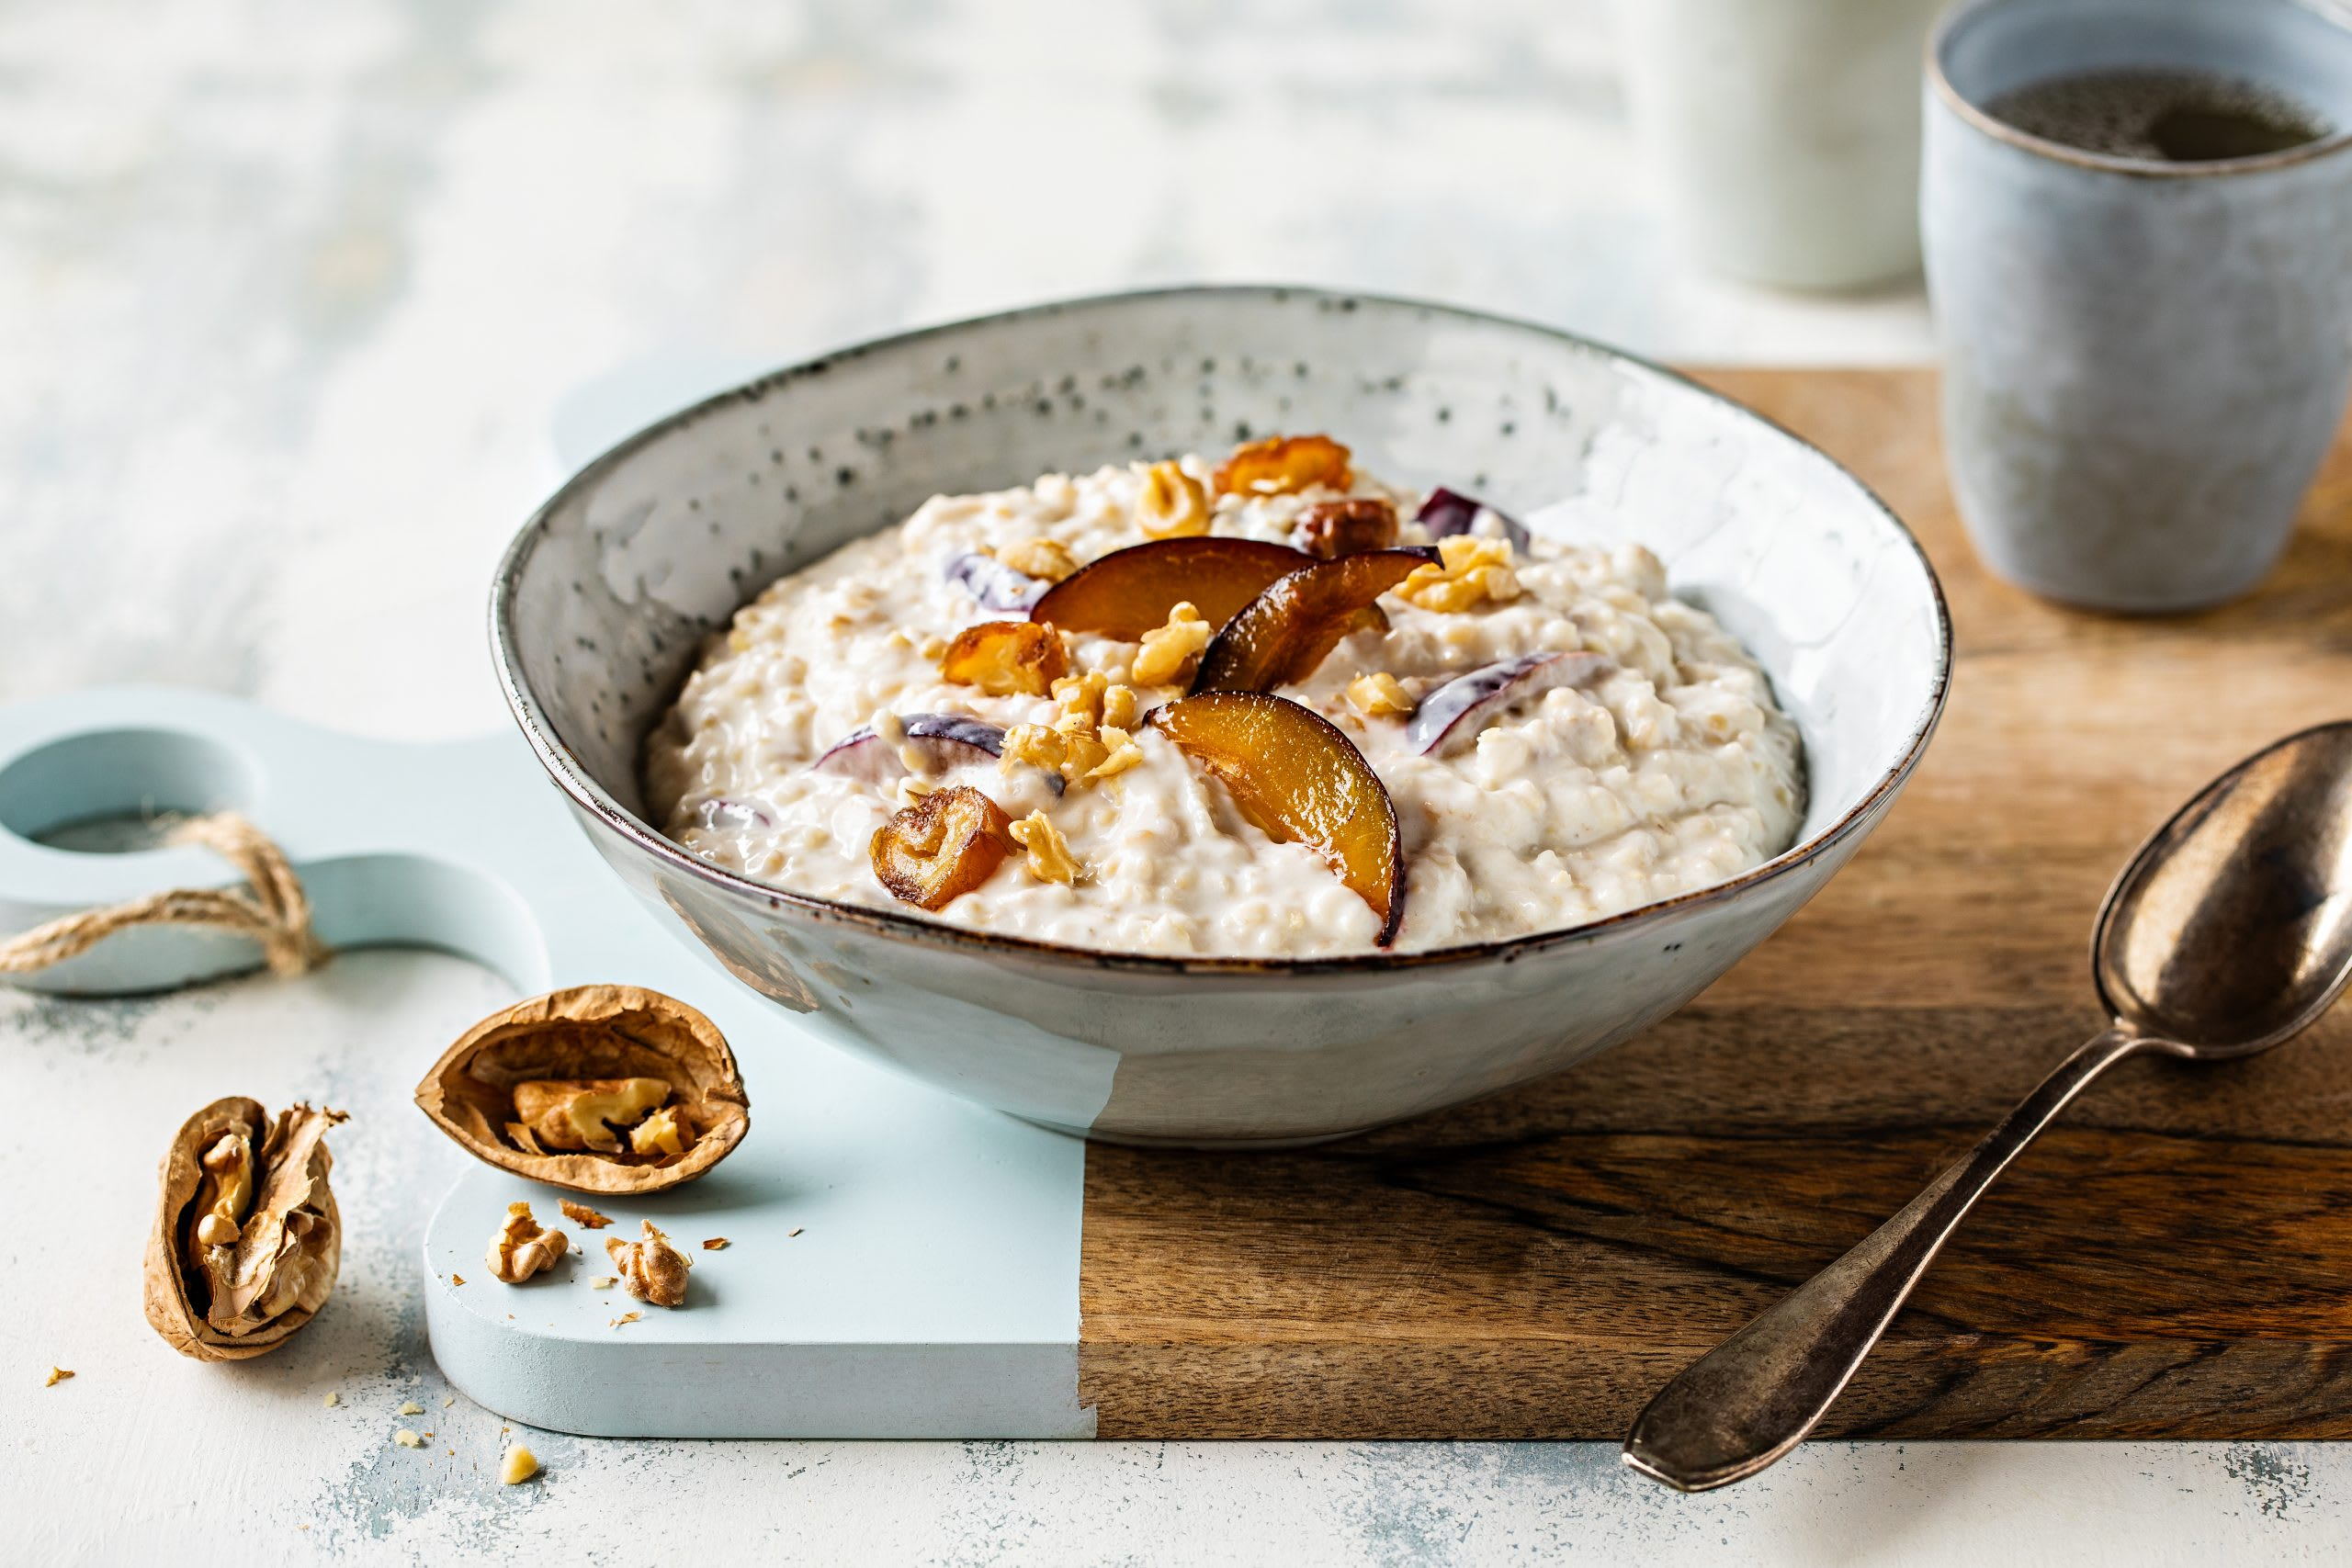 Birnen-Zwetschgen-Porridge mit Datteln